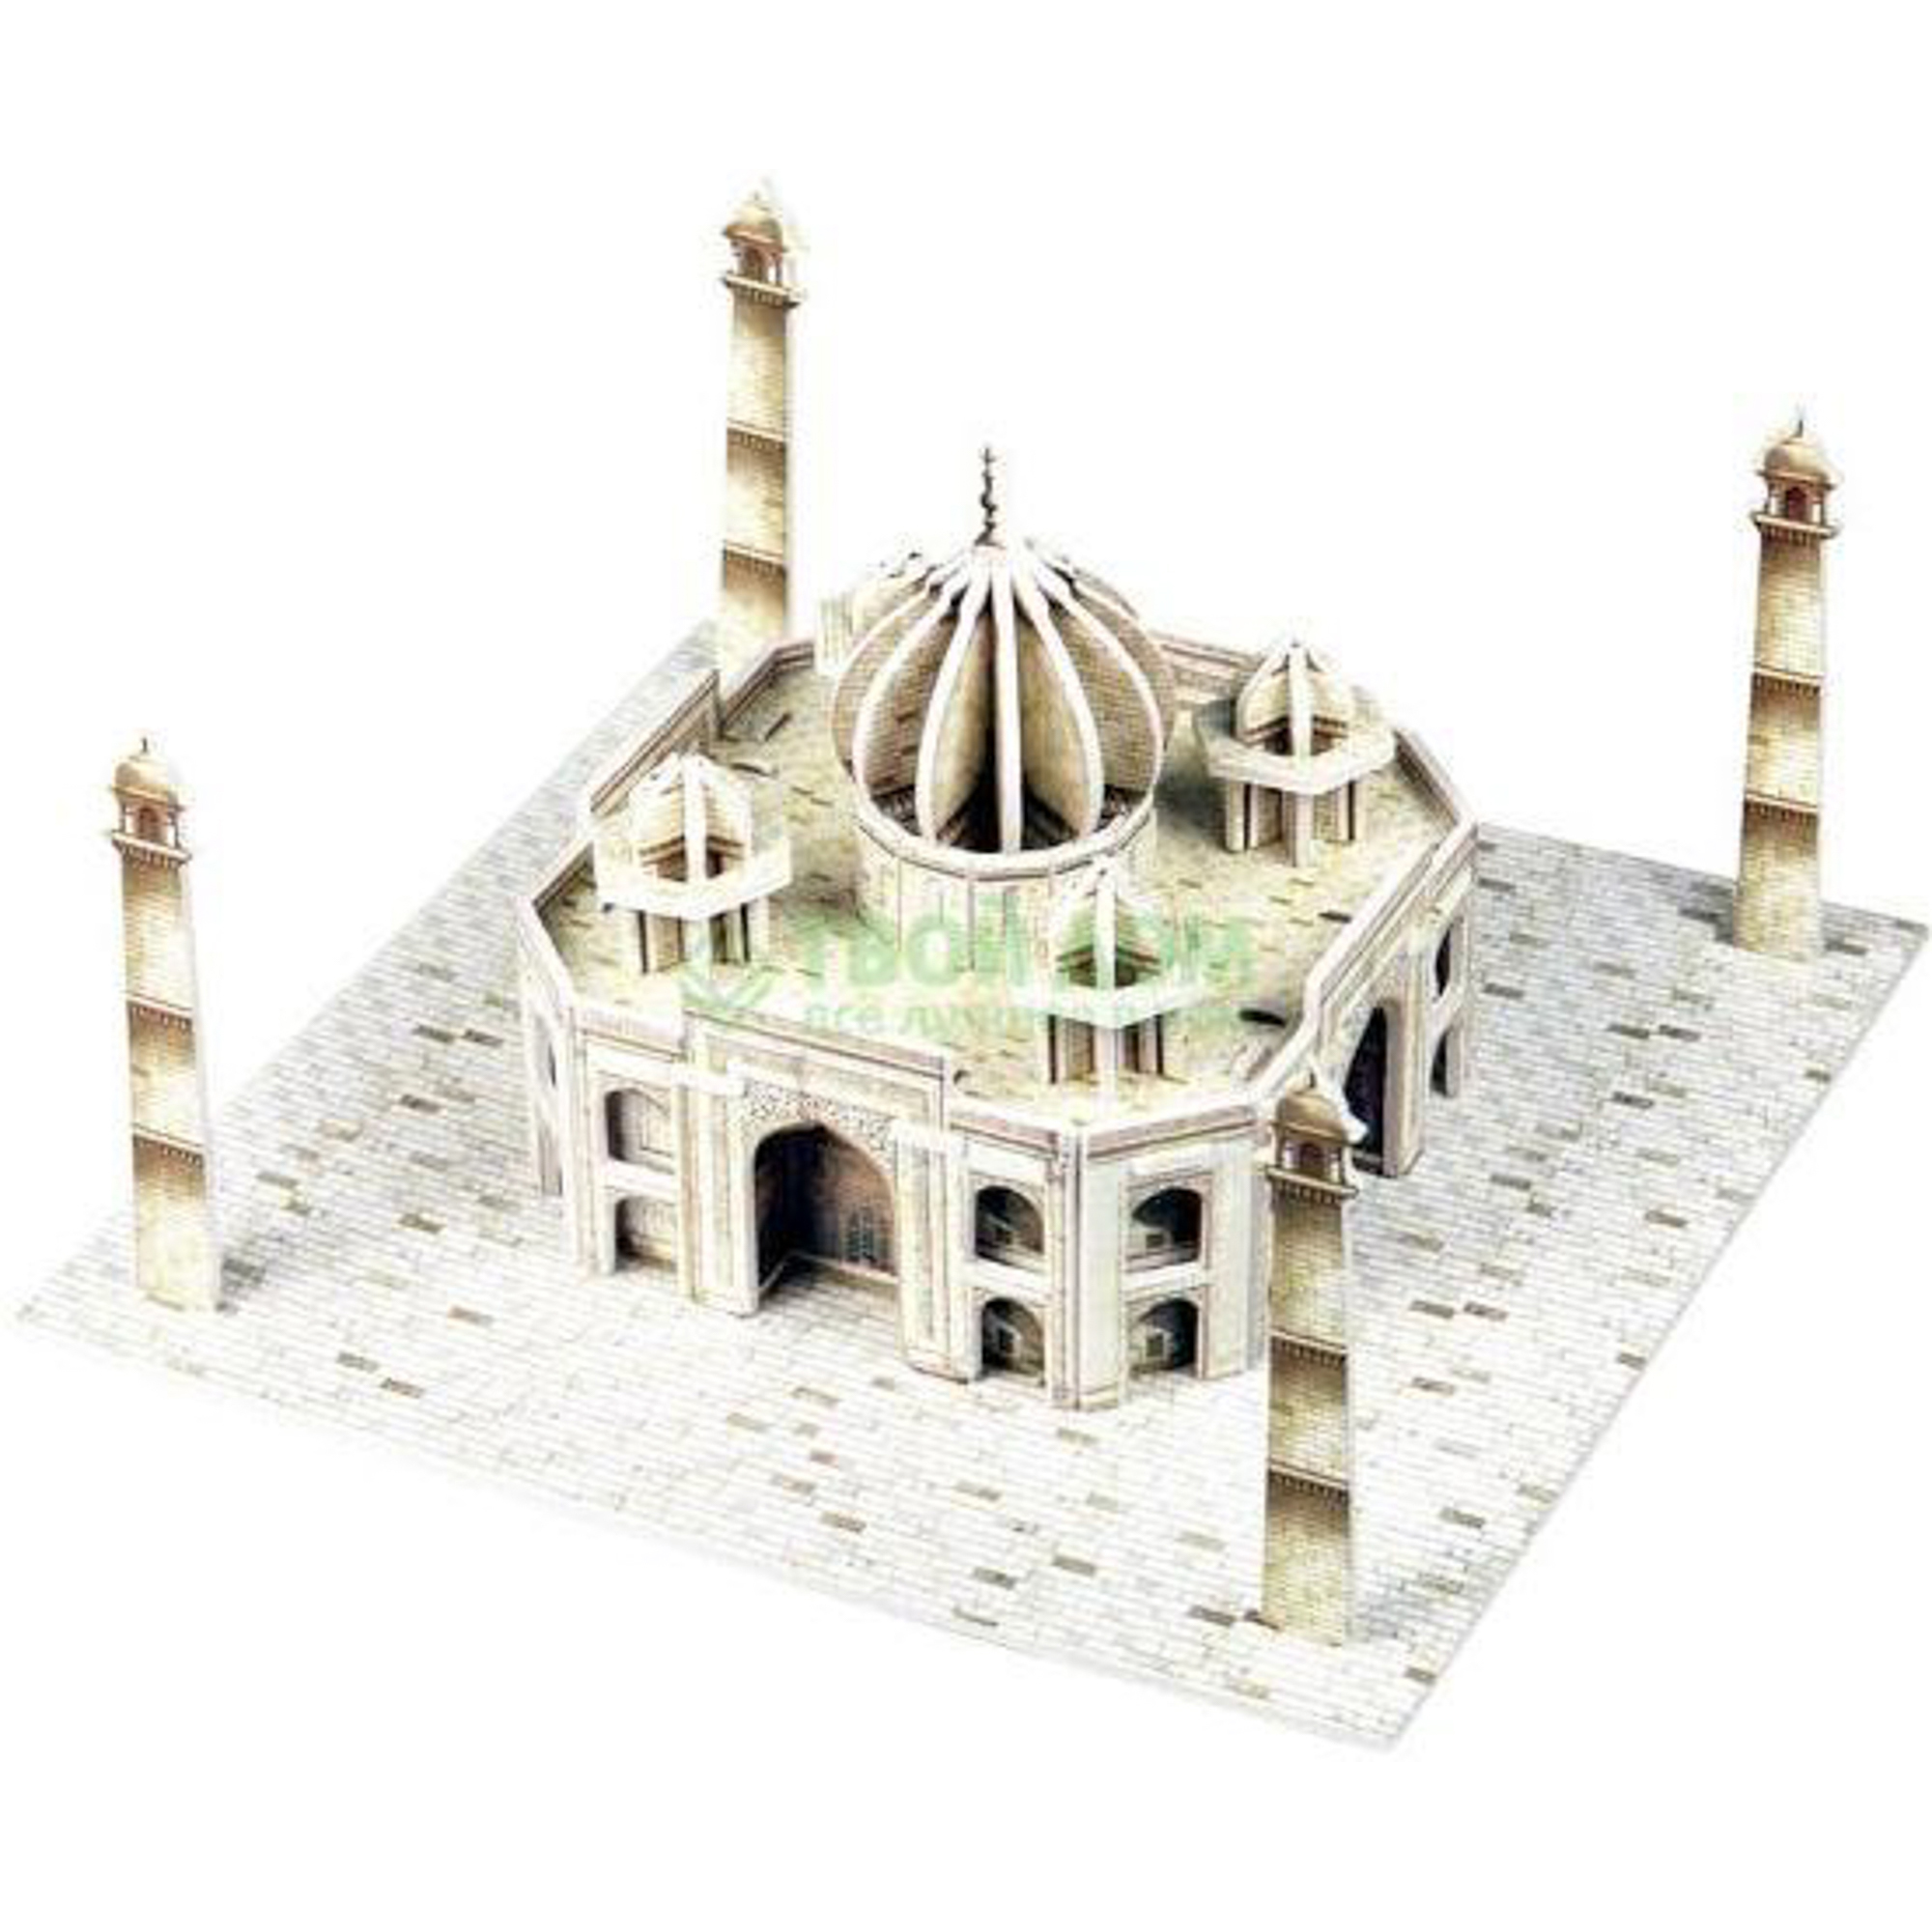 3D-пазл CubicFun Тадж Махал S3009